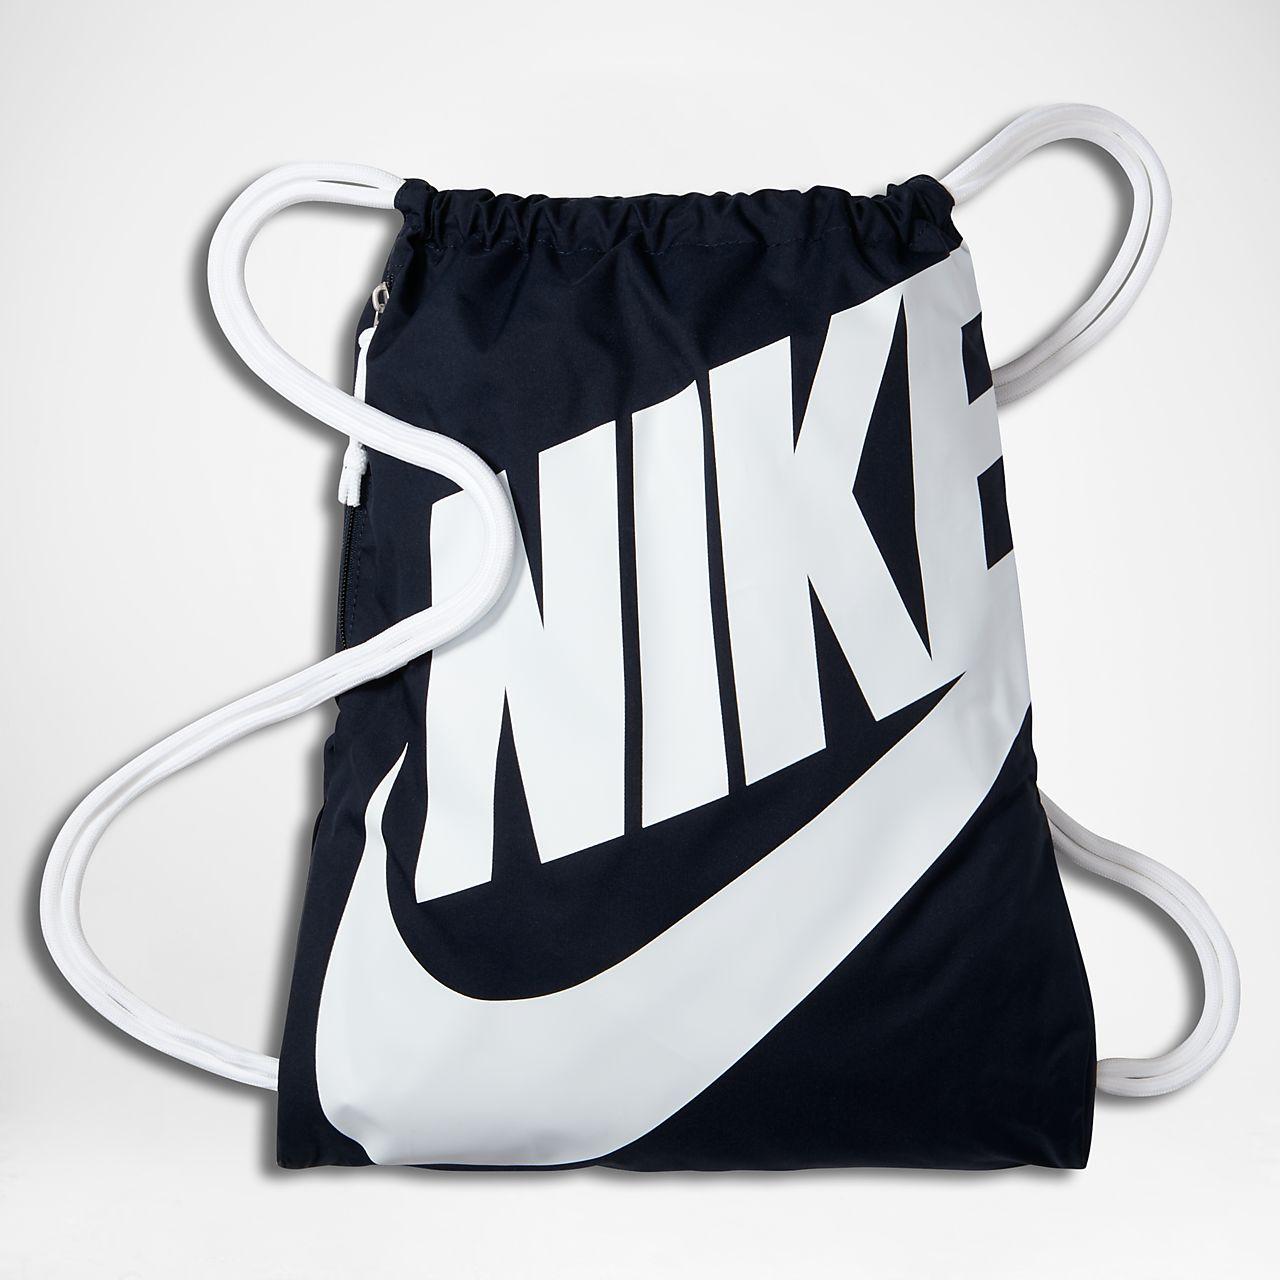 7bfe0735f4 Low Resolution Σακίδιο γυμναστηρίου Nike Sportswear Heritage Σακίδιο  γυμναστηρίου Nike Sportswear Heritage